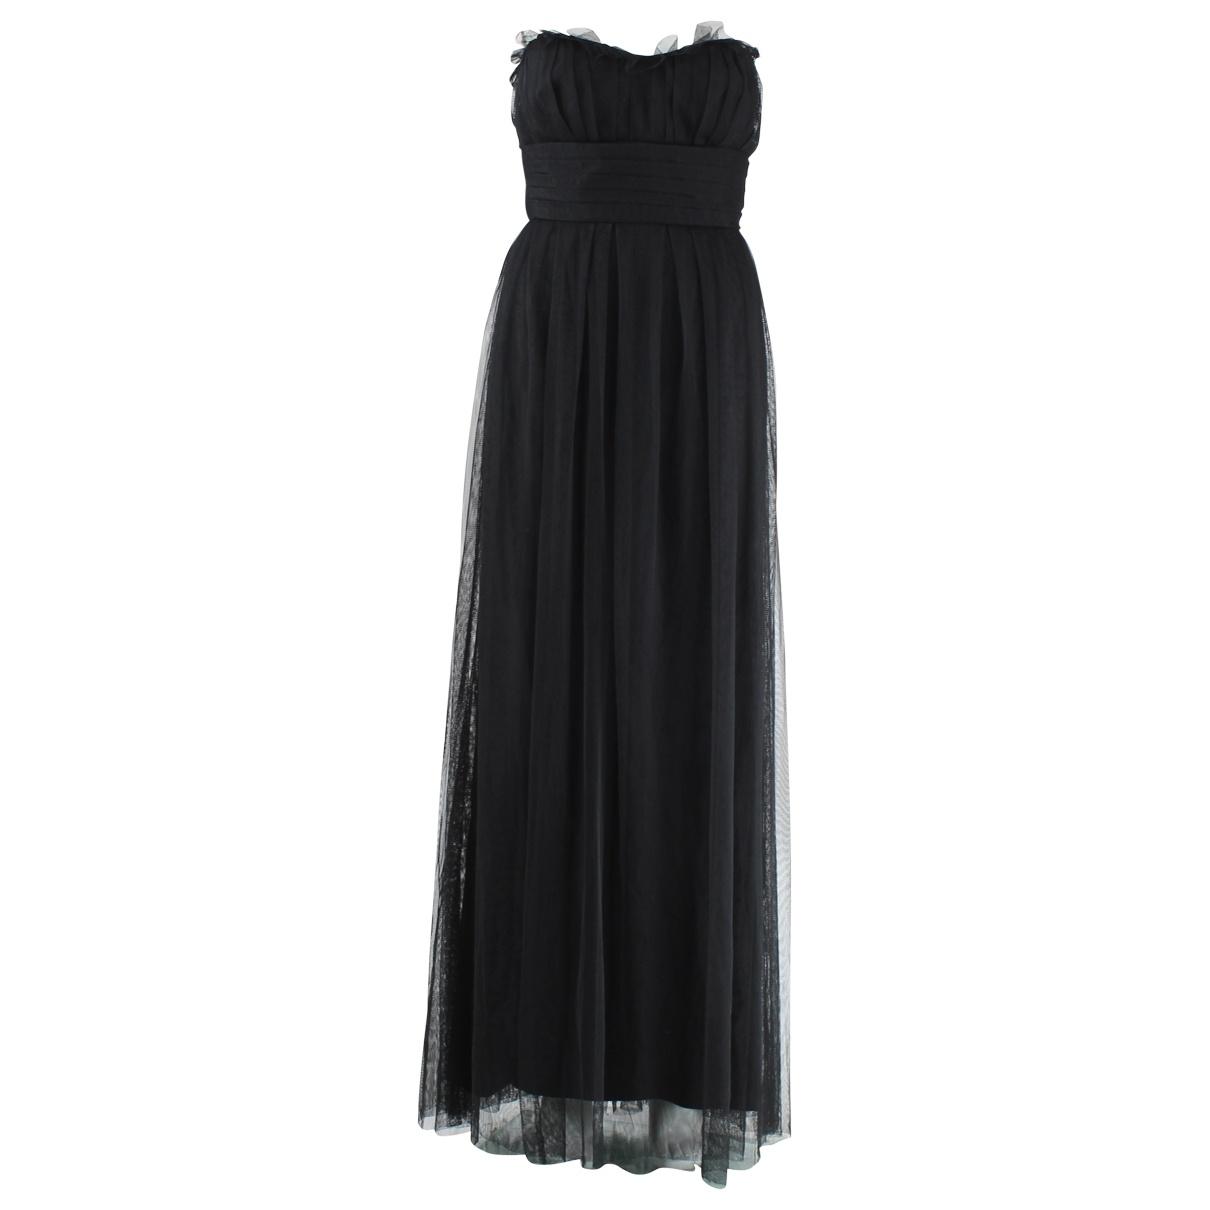 Vera Wang \N Black Lace dress for Women 8 US